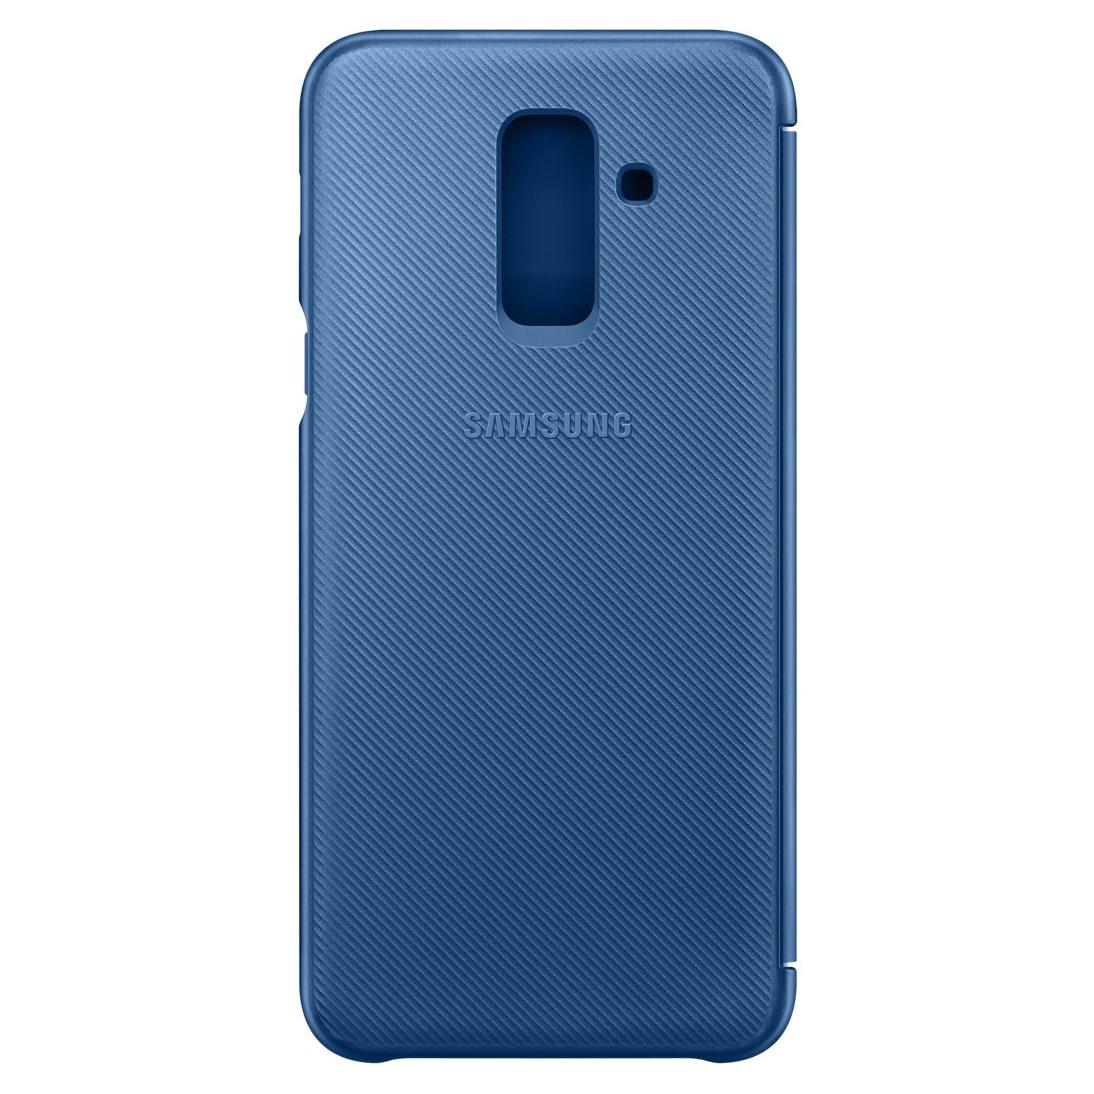 Fotografie Husa de protectie Samsung Wallet Cover pentru Galaxy A6 Plus (2018), Orchid Blue